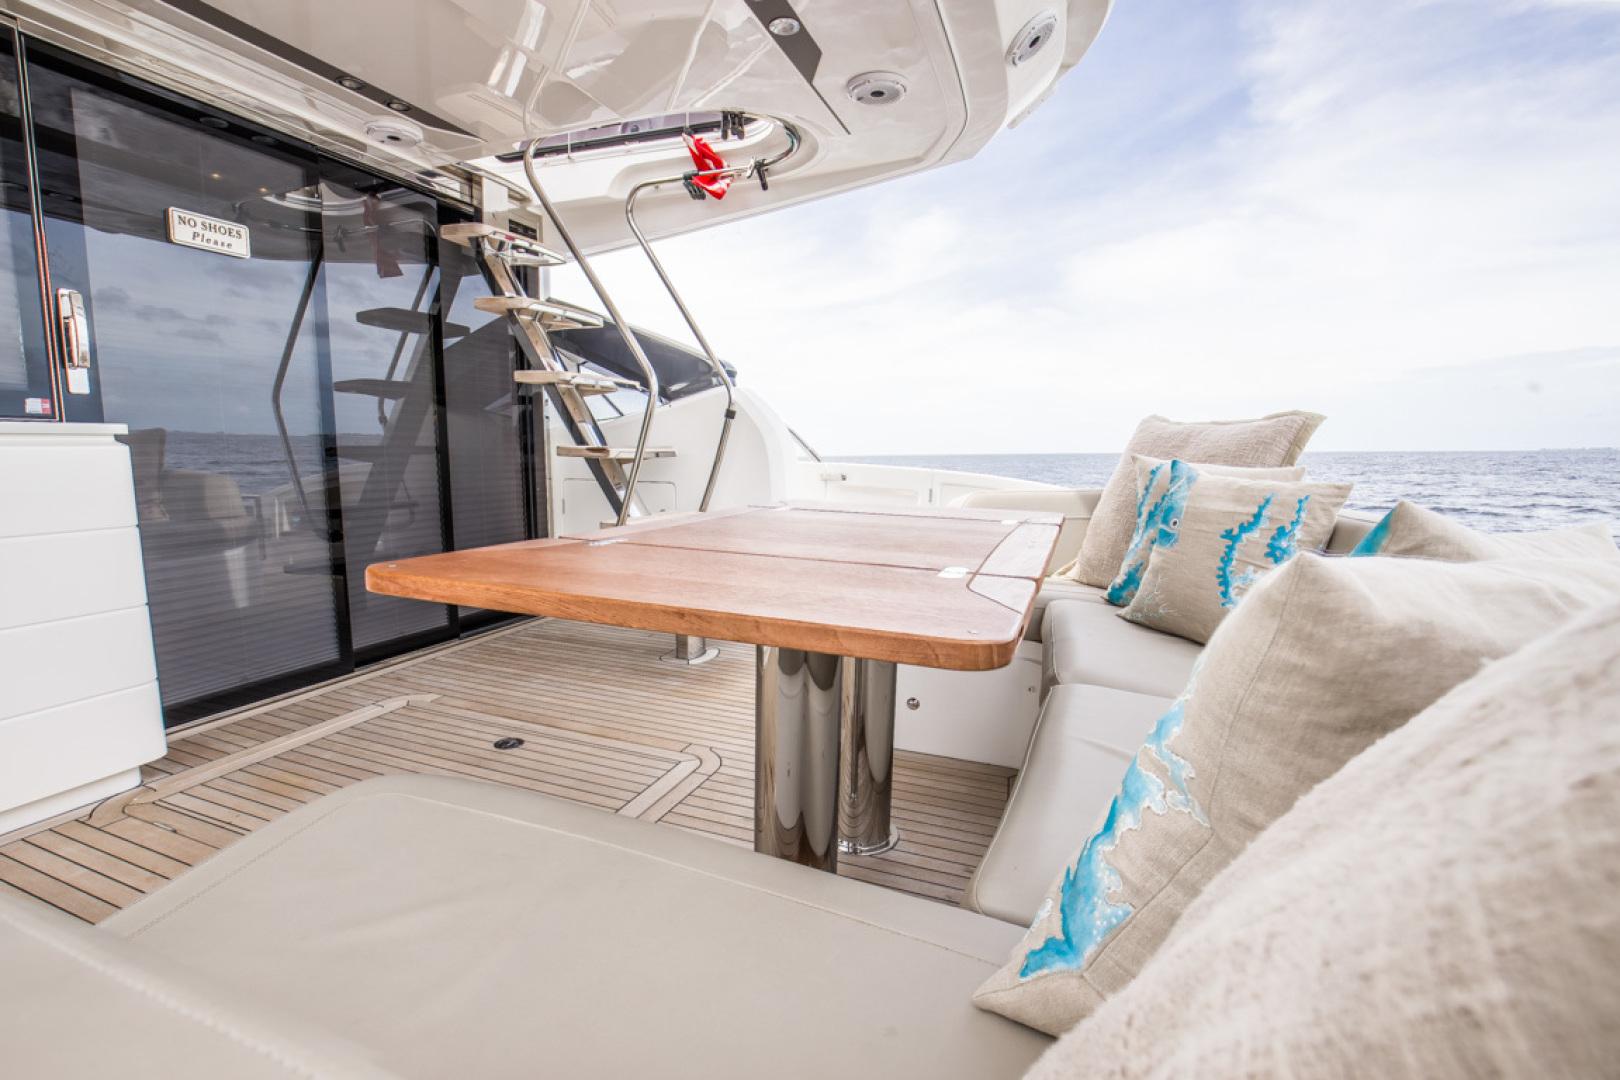 Princess-S65 2019-Paragon Cape Coral-Florida-United States-2019 65 Princess S65-Paragon-Cockpit-1510254 | Thumbnail